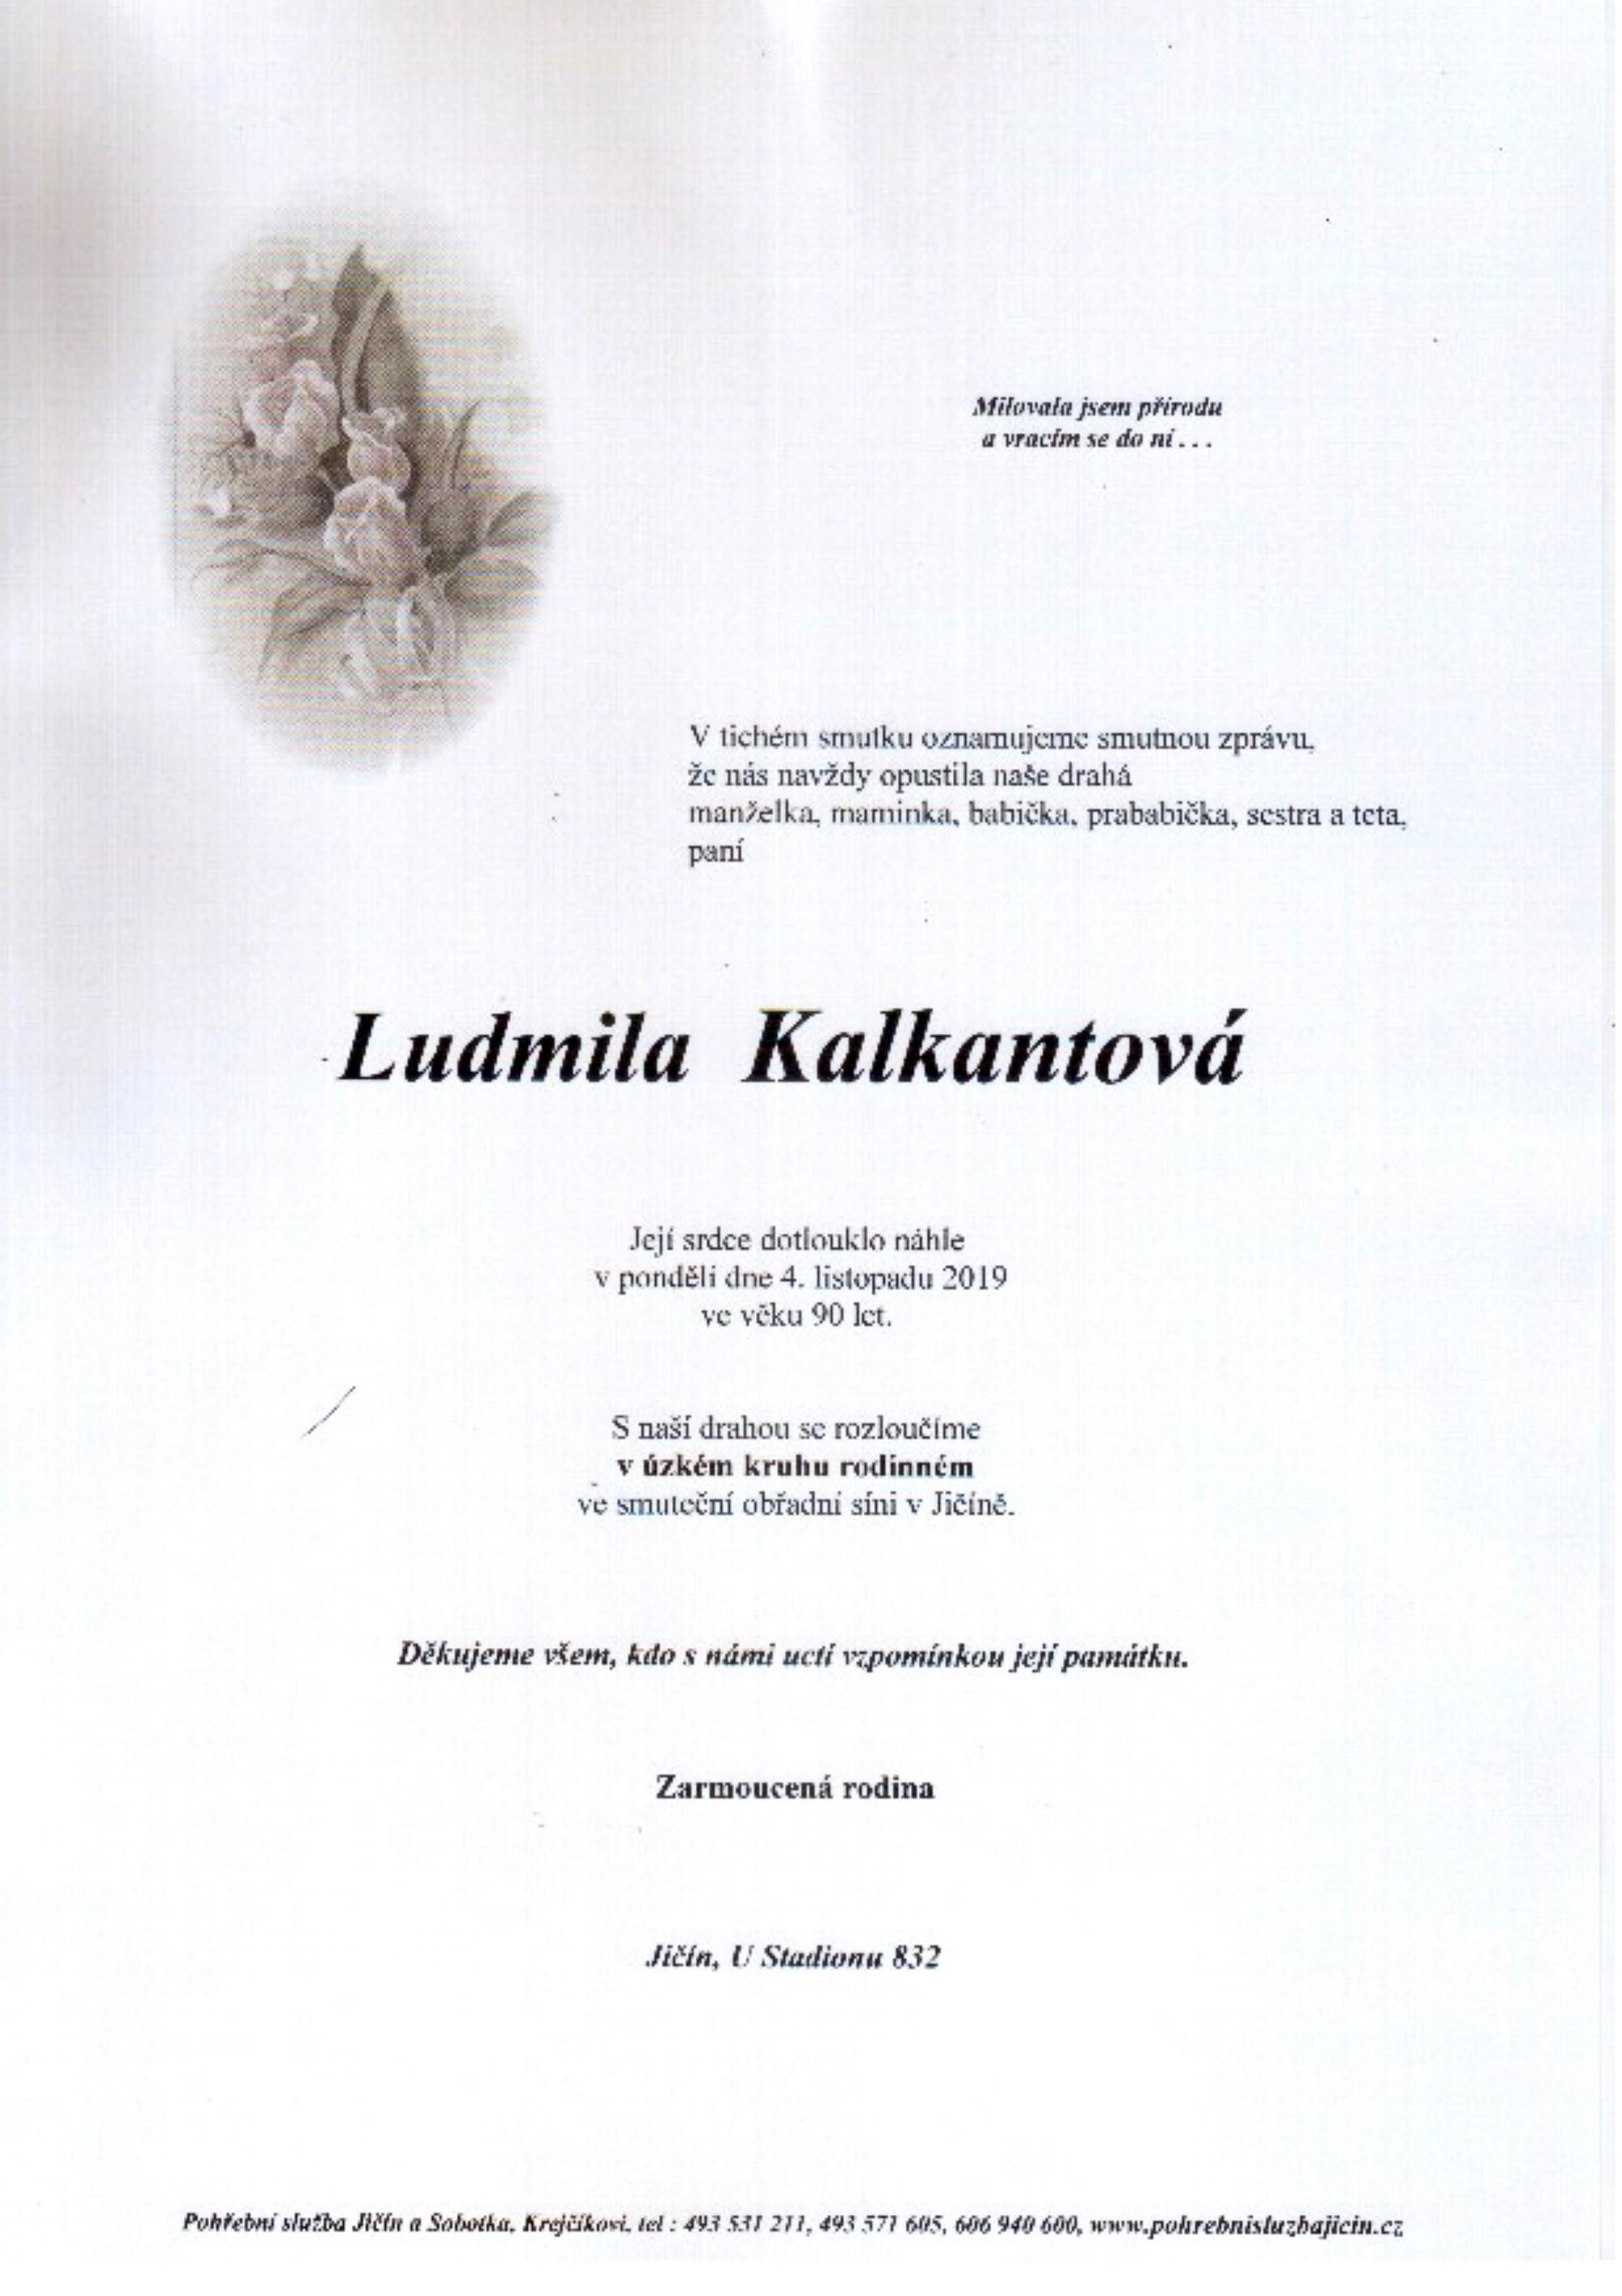 Ludmila Kalkantová